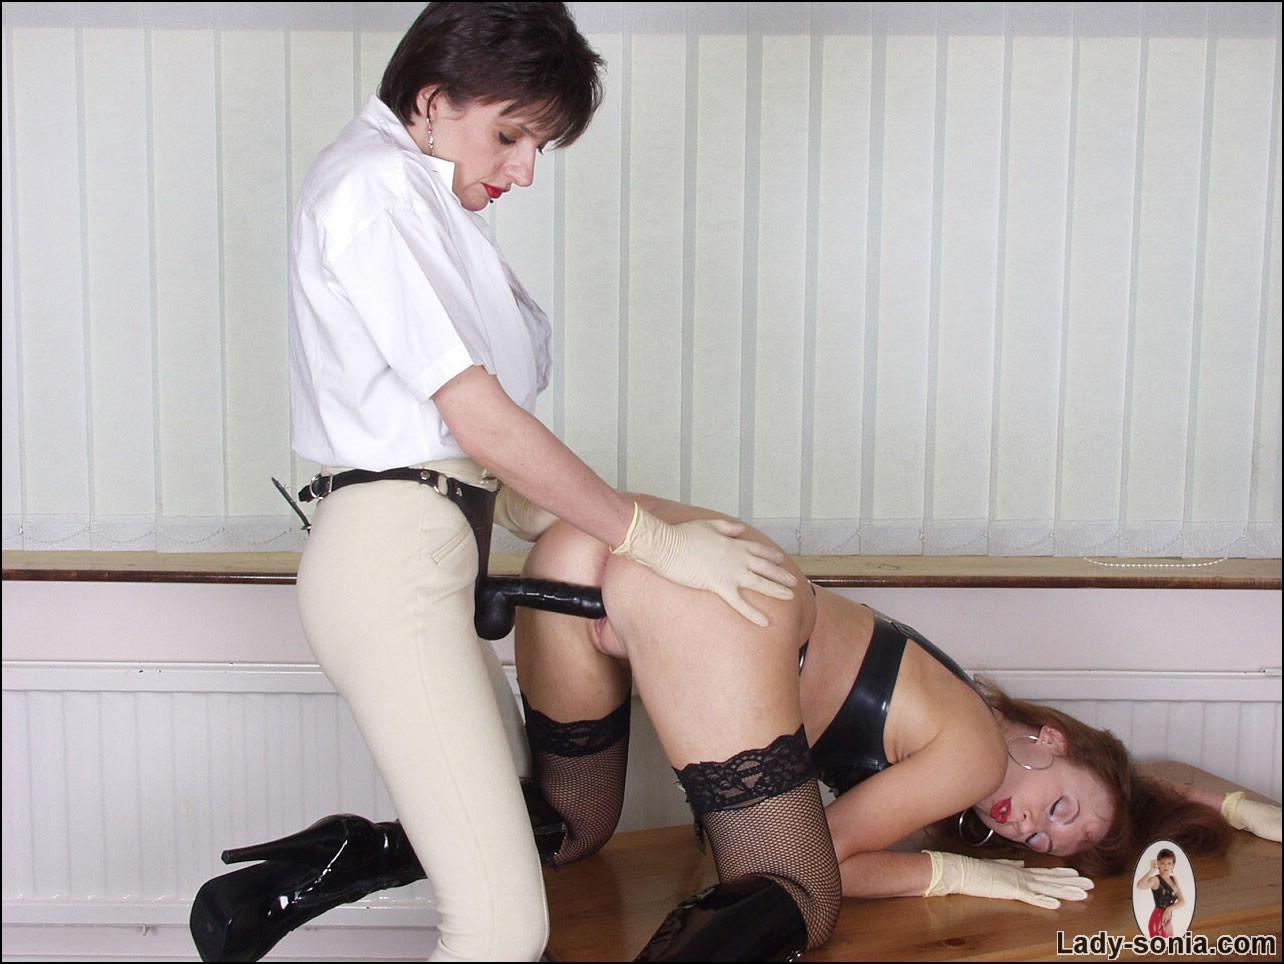 Teen Lesbian Strap Threesome